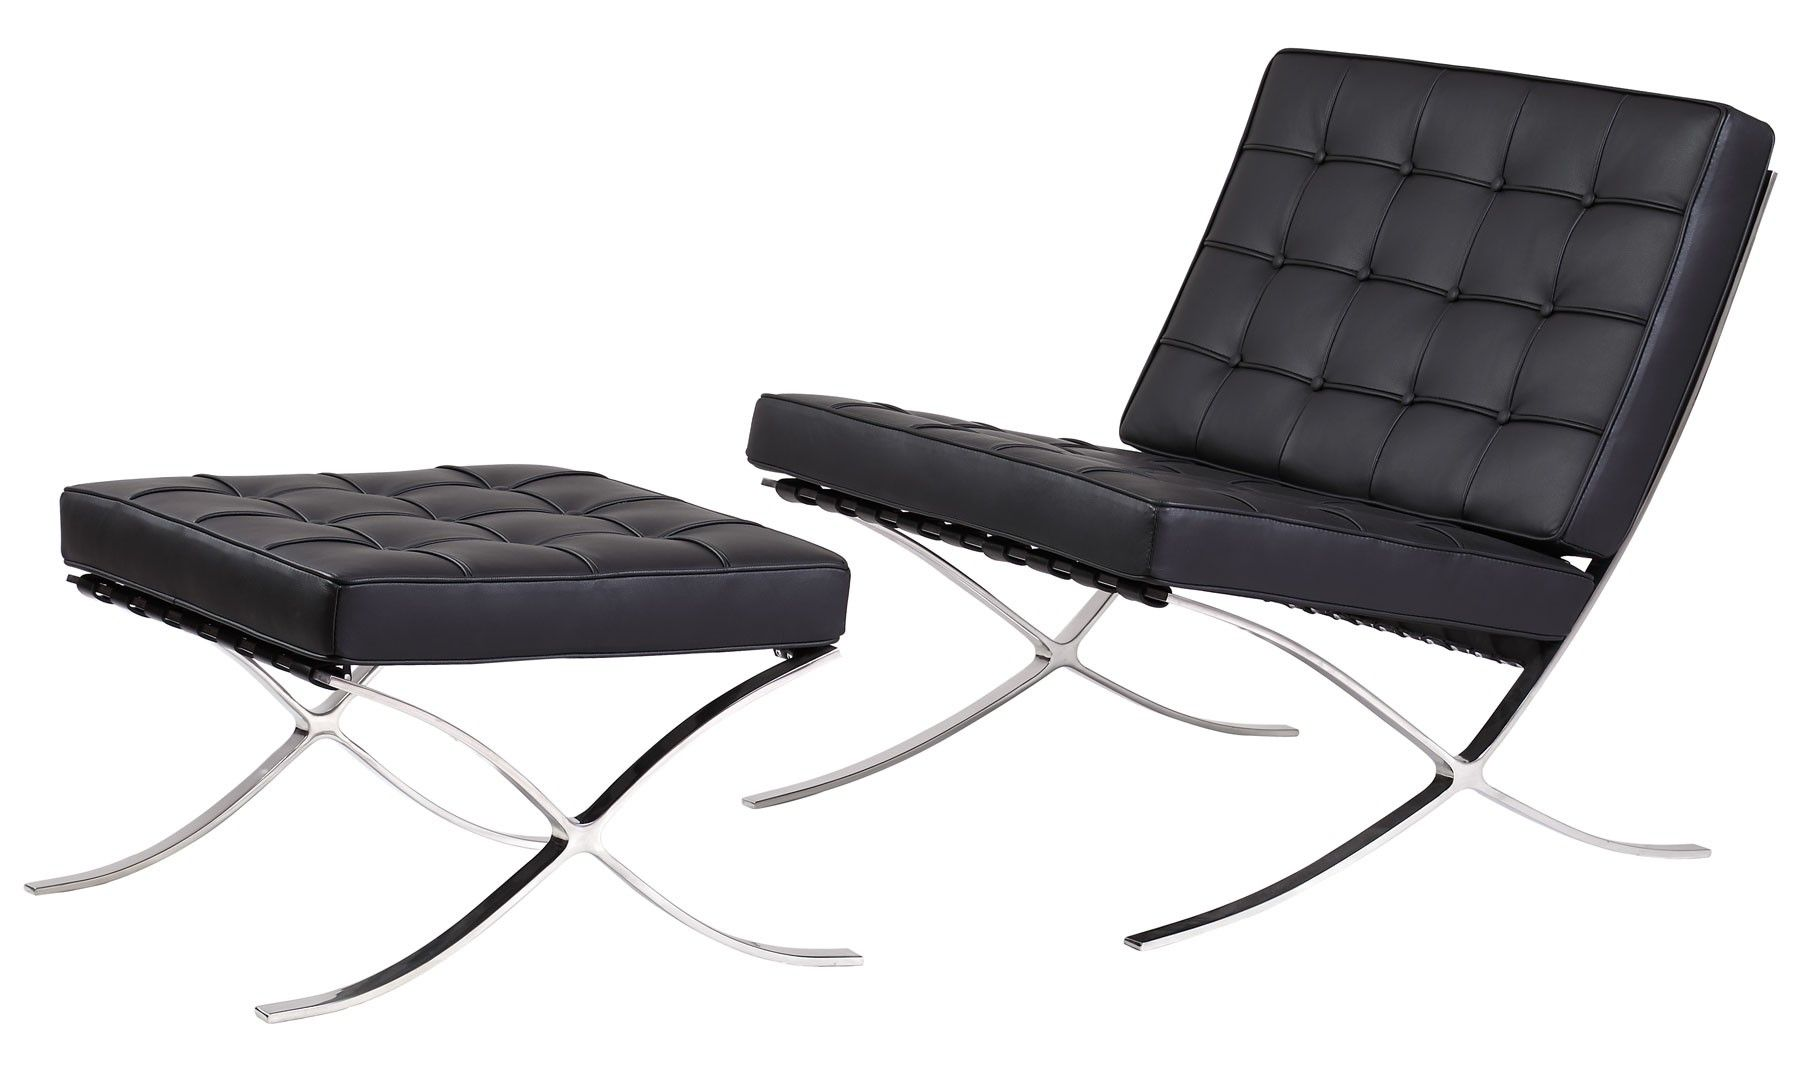 Barcelona Chair On Wall By Tv Barcelona Chair Chair Buy Chair